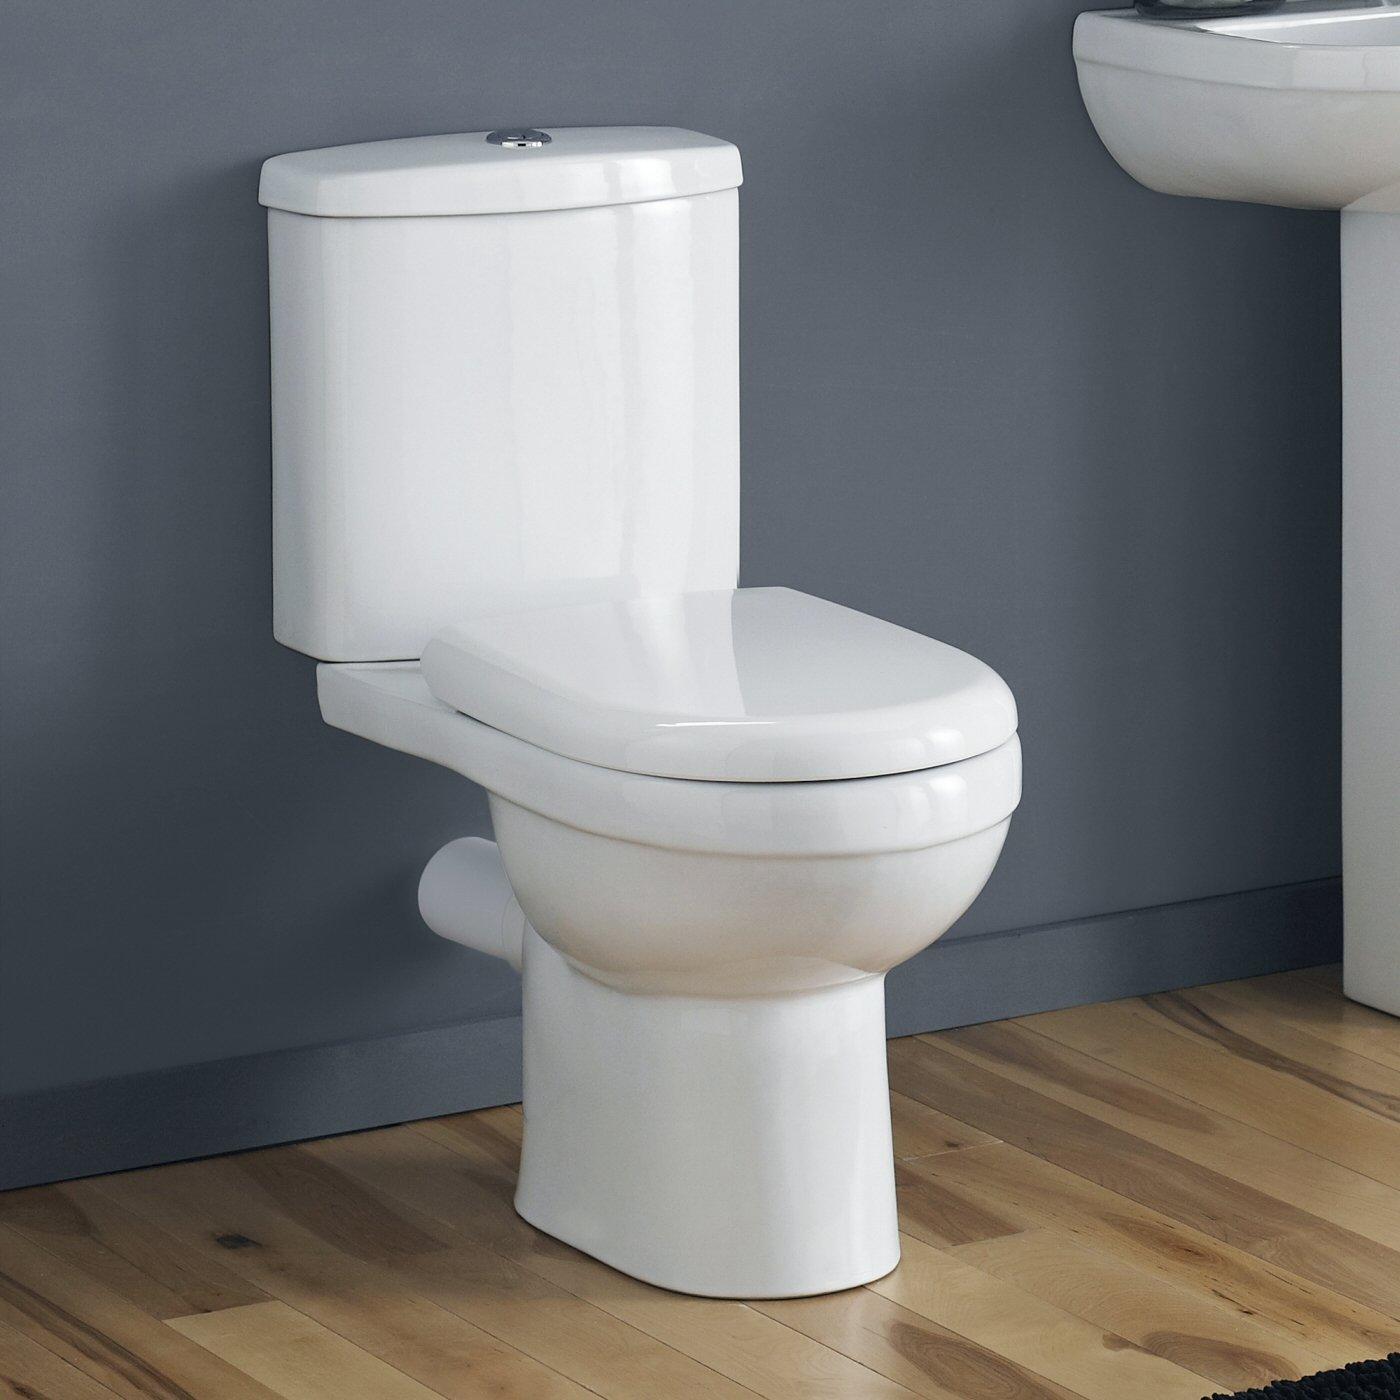 2-teilige Toilette mit Sp/ülkasten aus Keramik Inkl Hudson Reed Stand-WC Breve WC-Sitz inklusive Absenkautomatik Sp/ülmechanismus